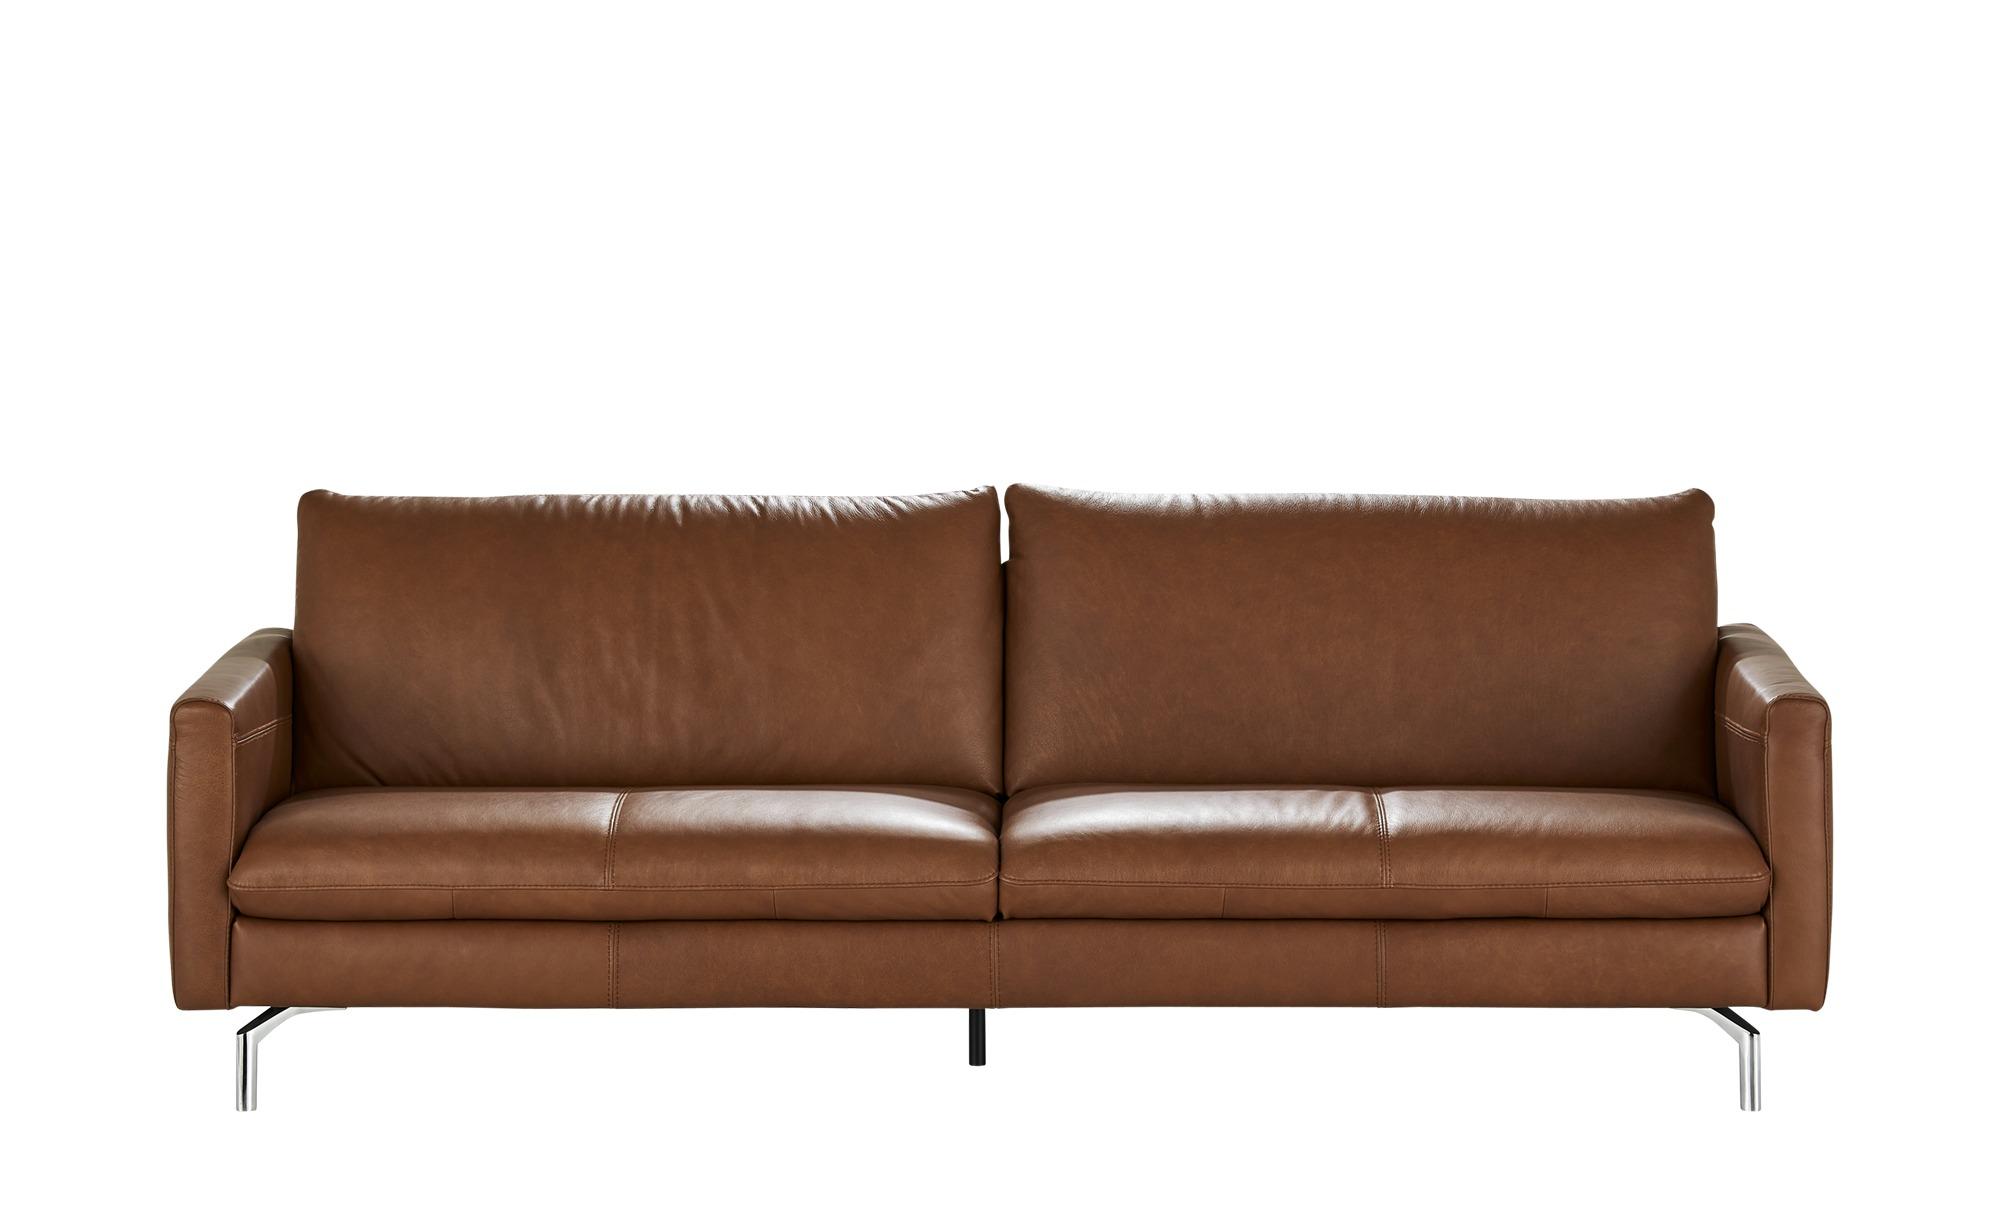 Natuzzi Editions Leder-Sofa  Premura ¦ braun ¦ Maße (cm): B: 239 H: 84 T: 90 Polstermöbel > Sofas > 3-Sitzer - Höffner